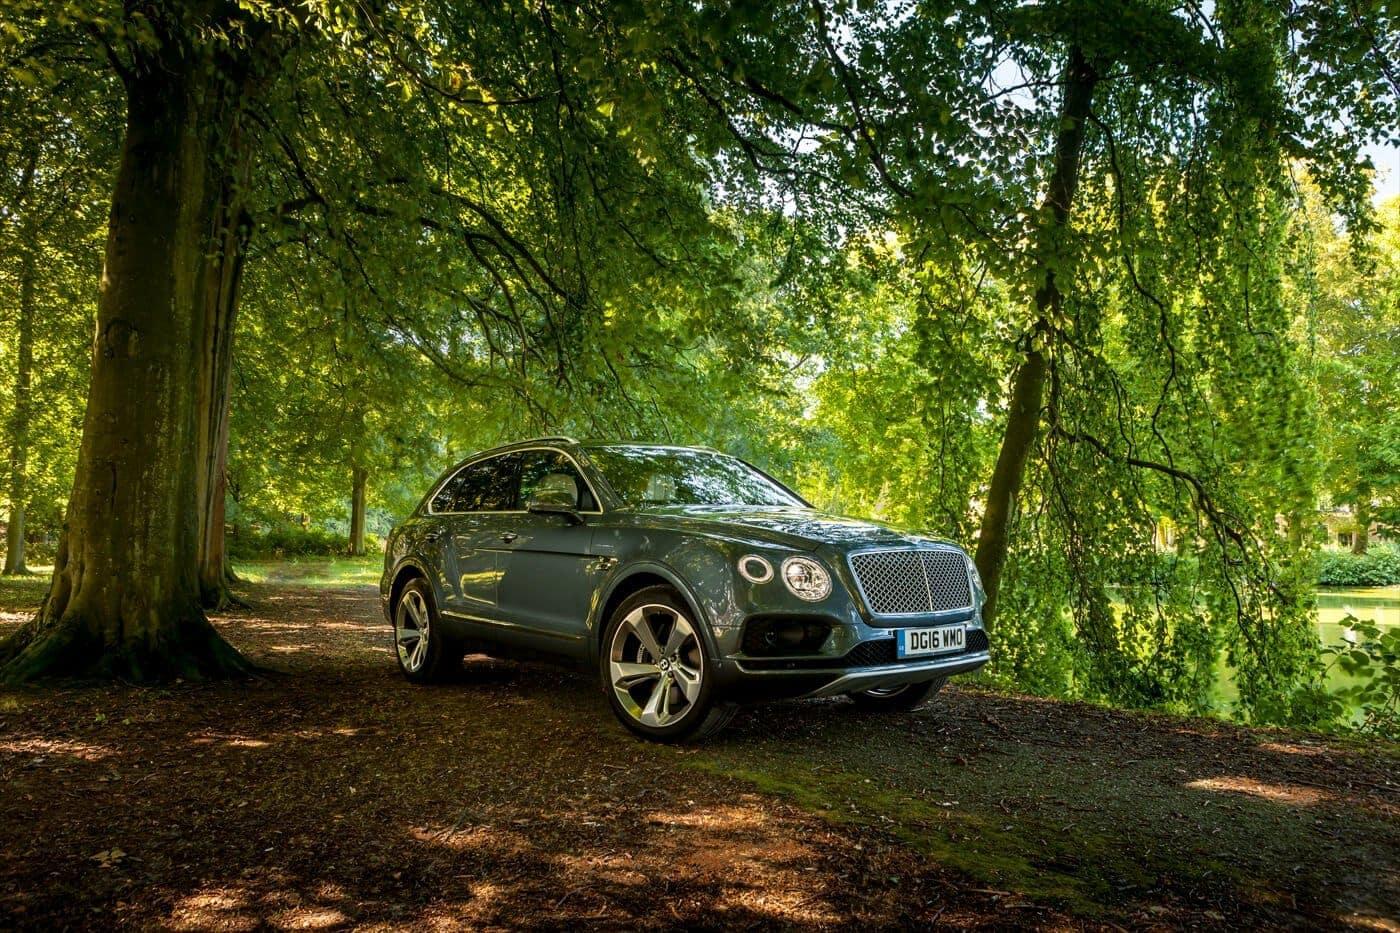 Bentley Bentayga Autogespot Automotive Auto Autofotografie Photoshoot